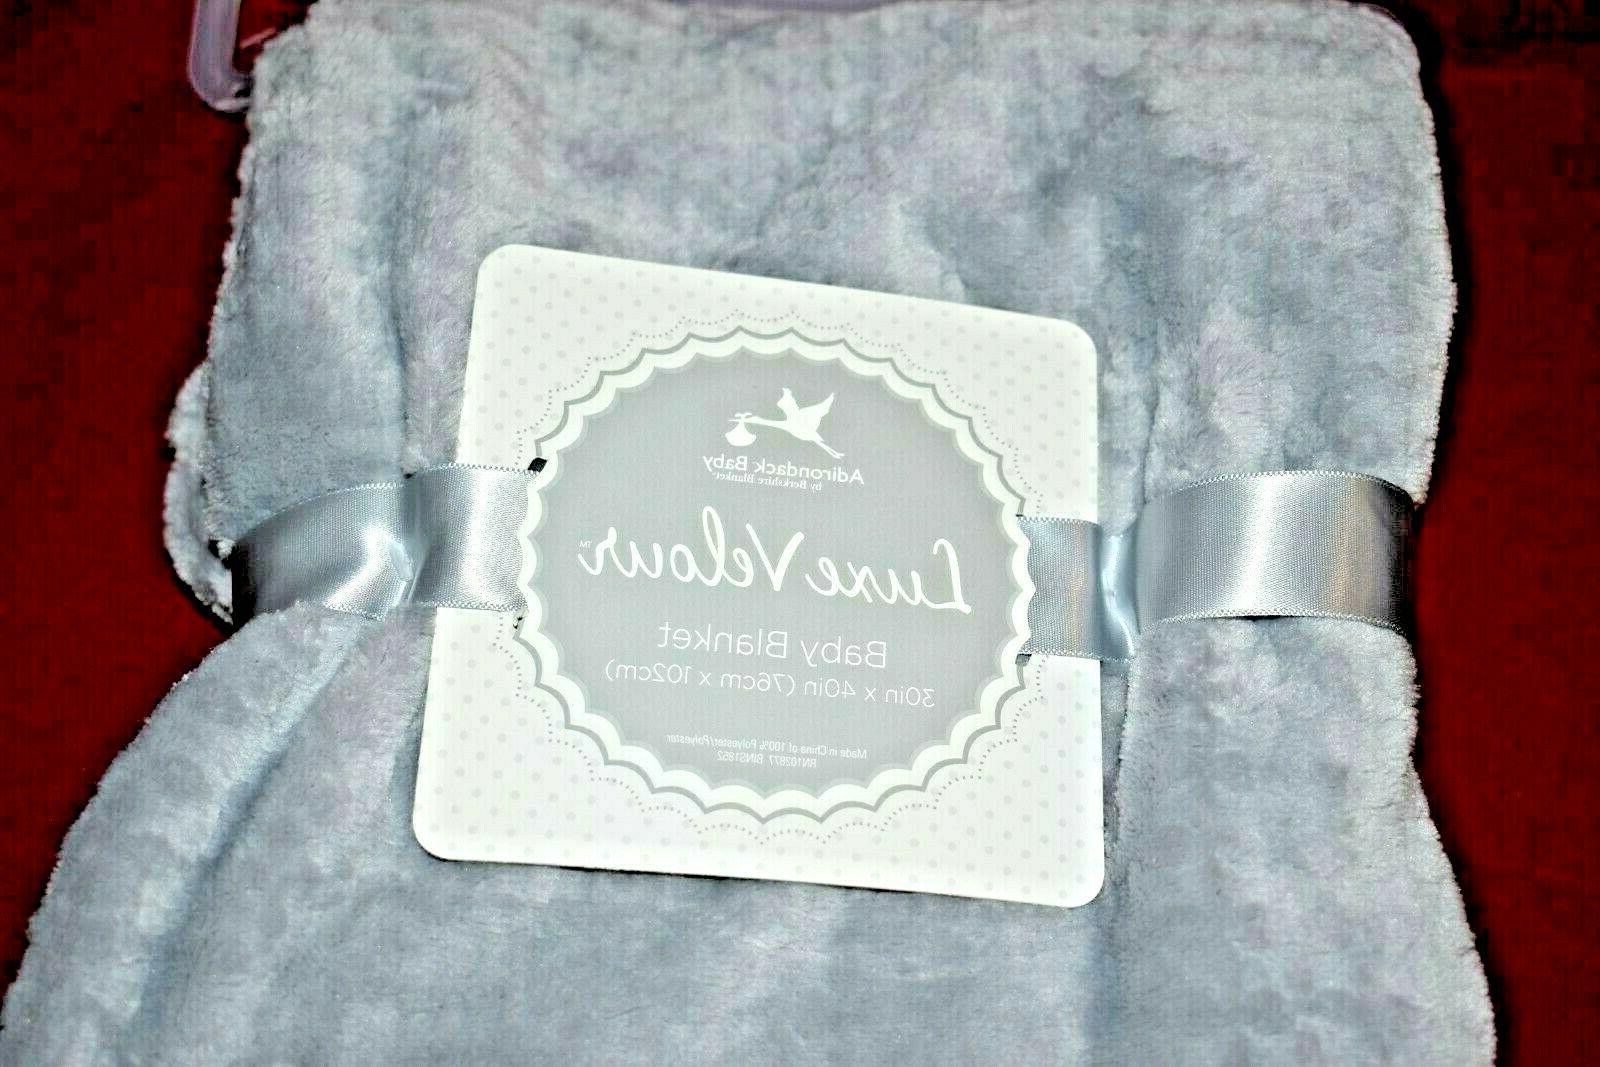 Adirondack Velour Soft x Blanket Gray